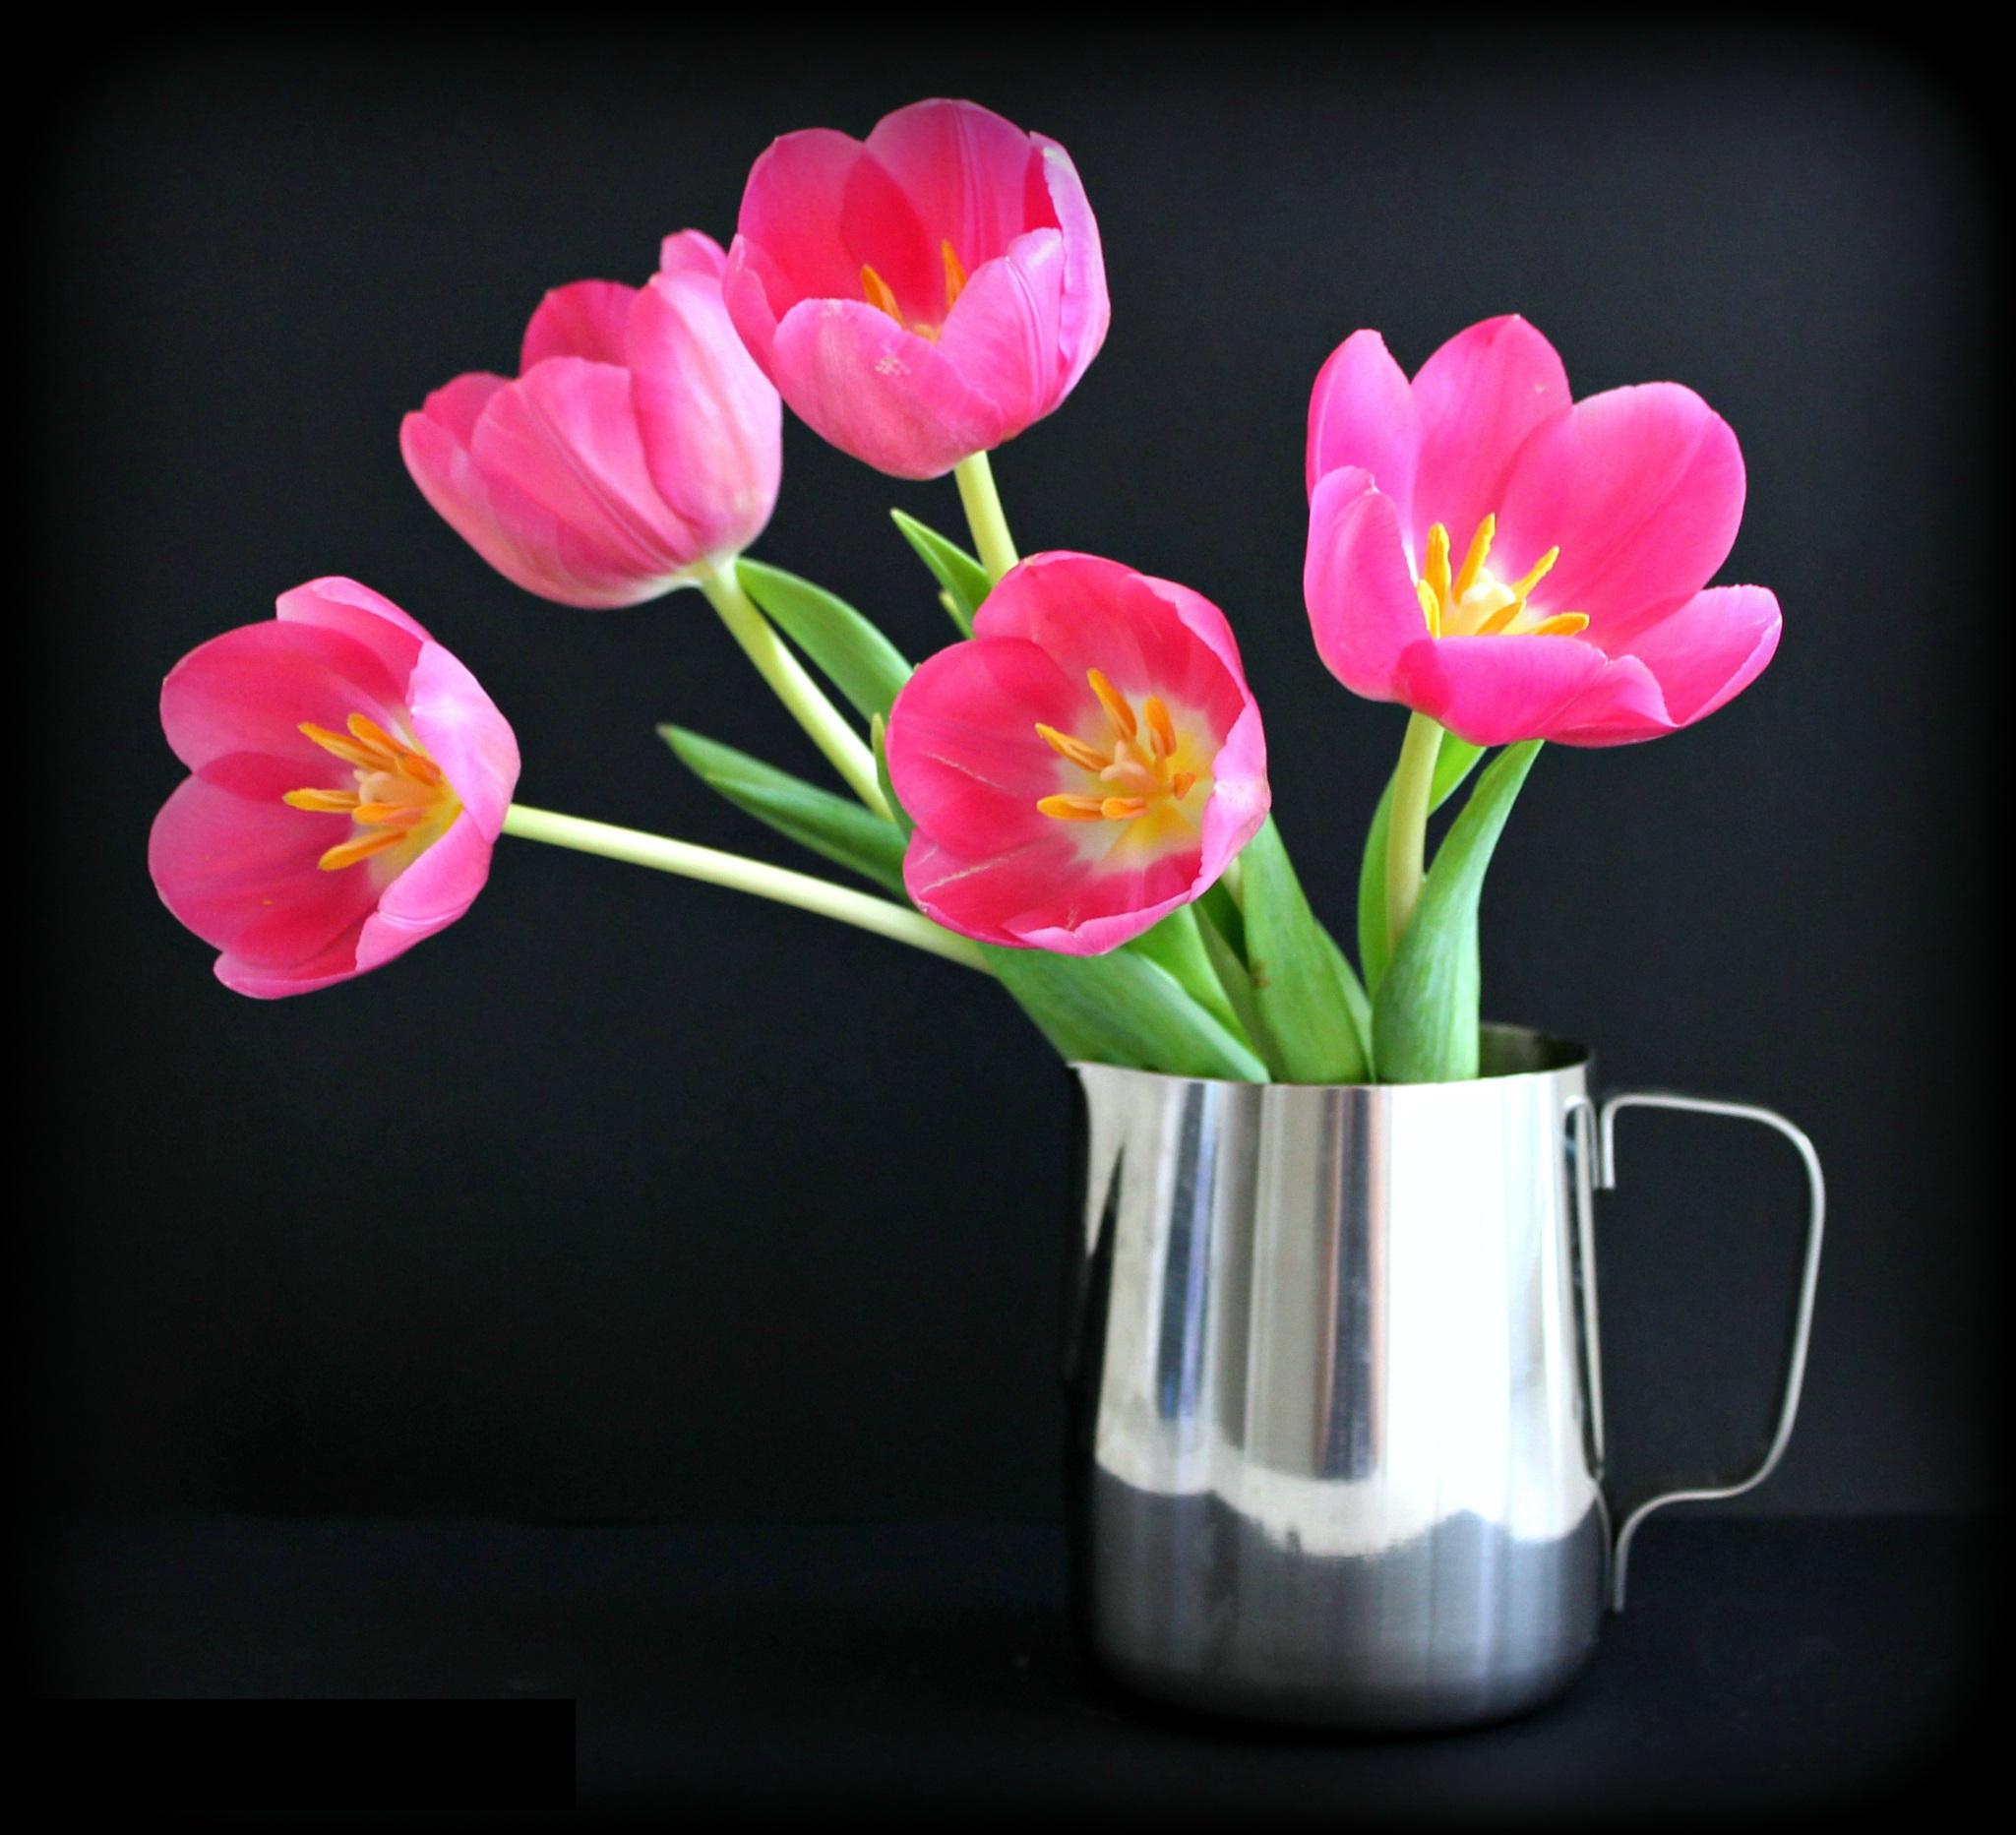 Домашние цветы фото и цвета